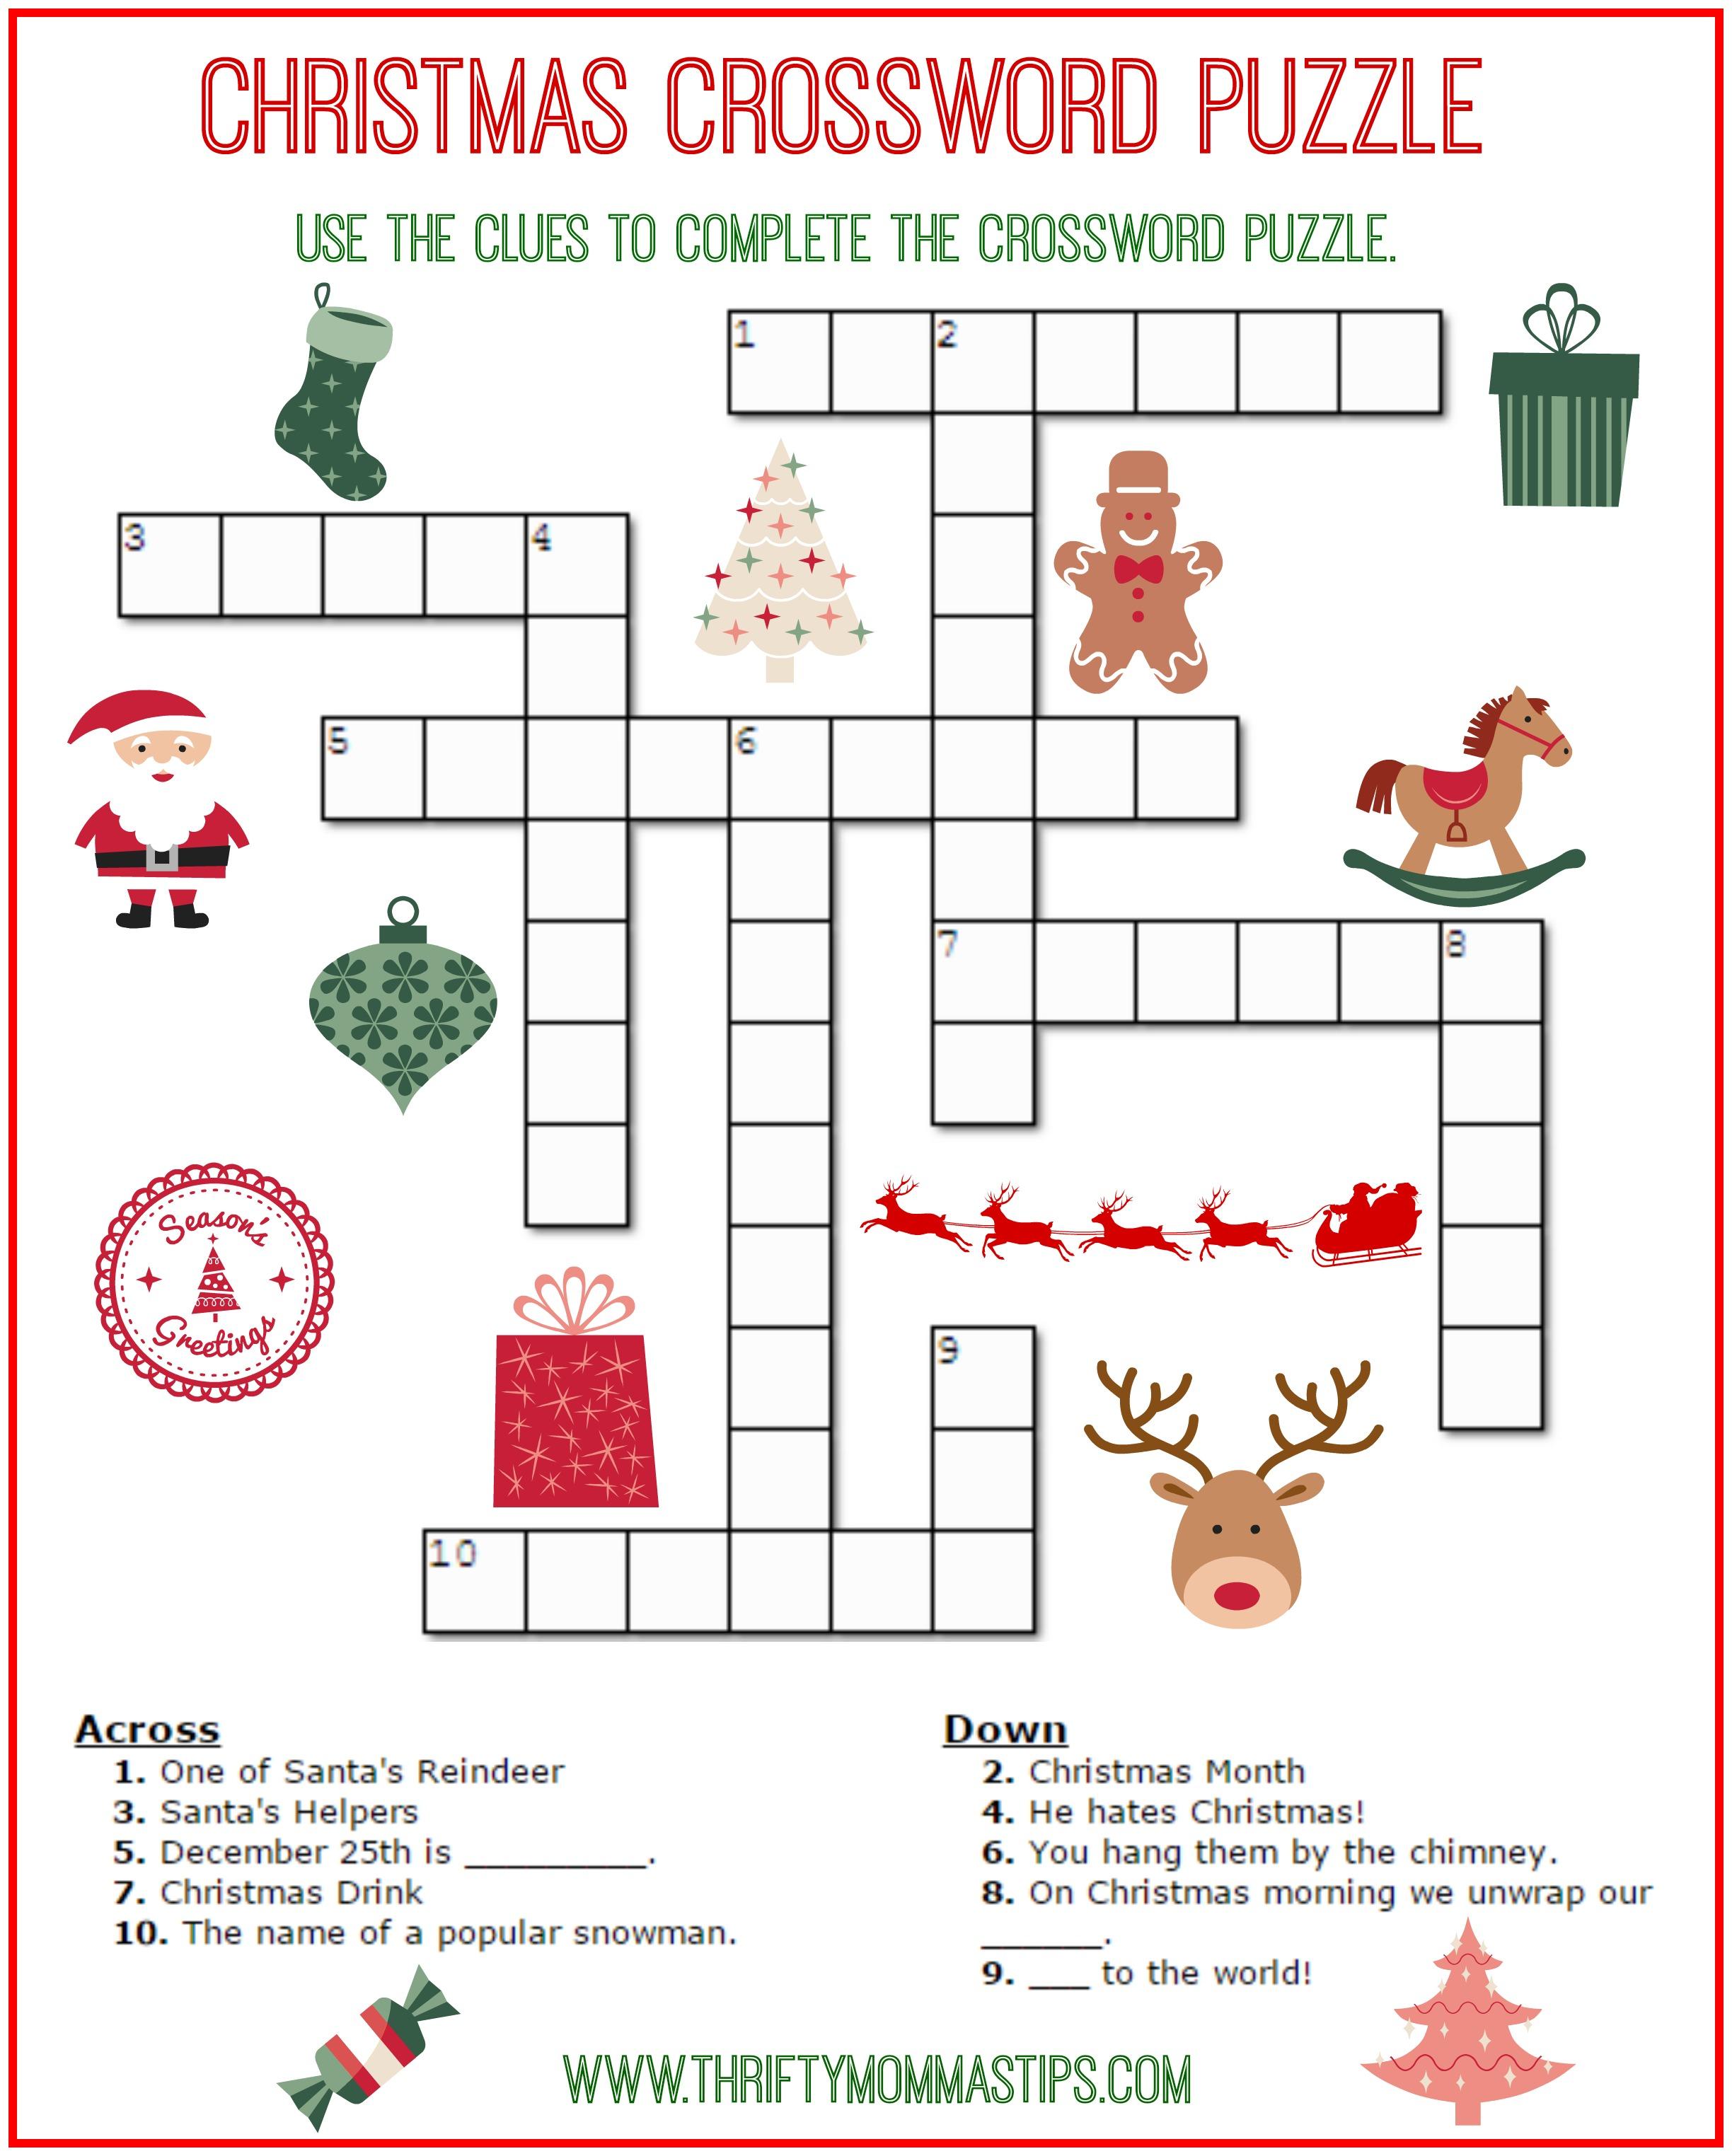 photo regarding Holiday Crossword Puzzles Printable called Xmas Crossword Puzzle Printable - Thrifty Mommas Ideas